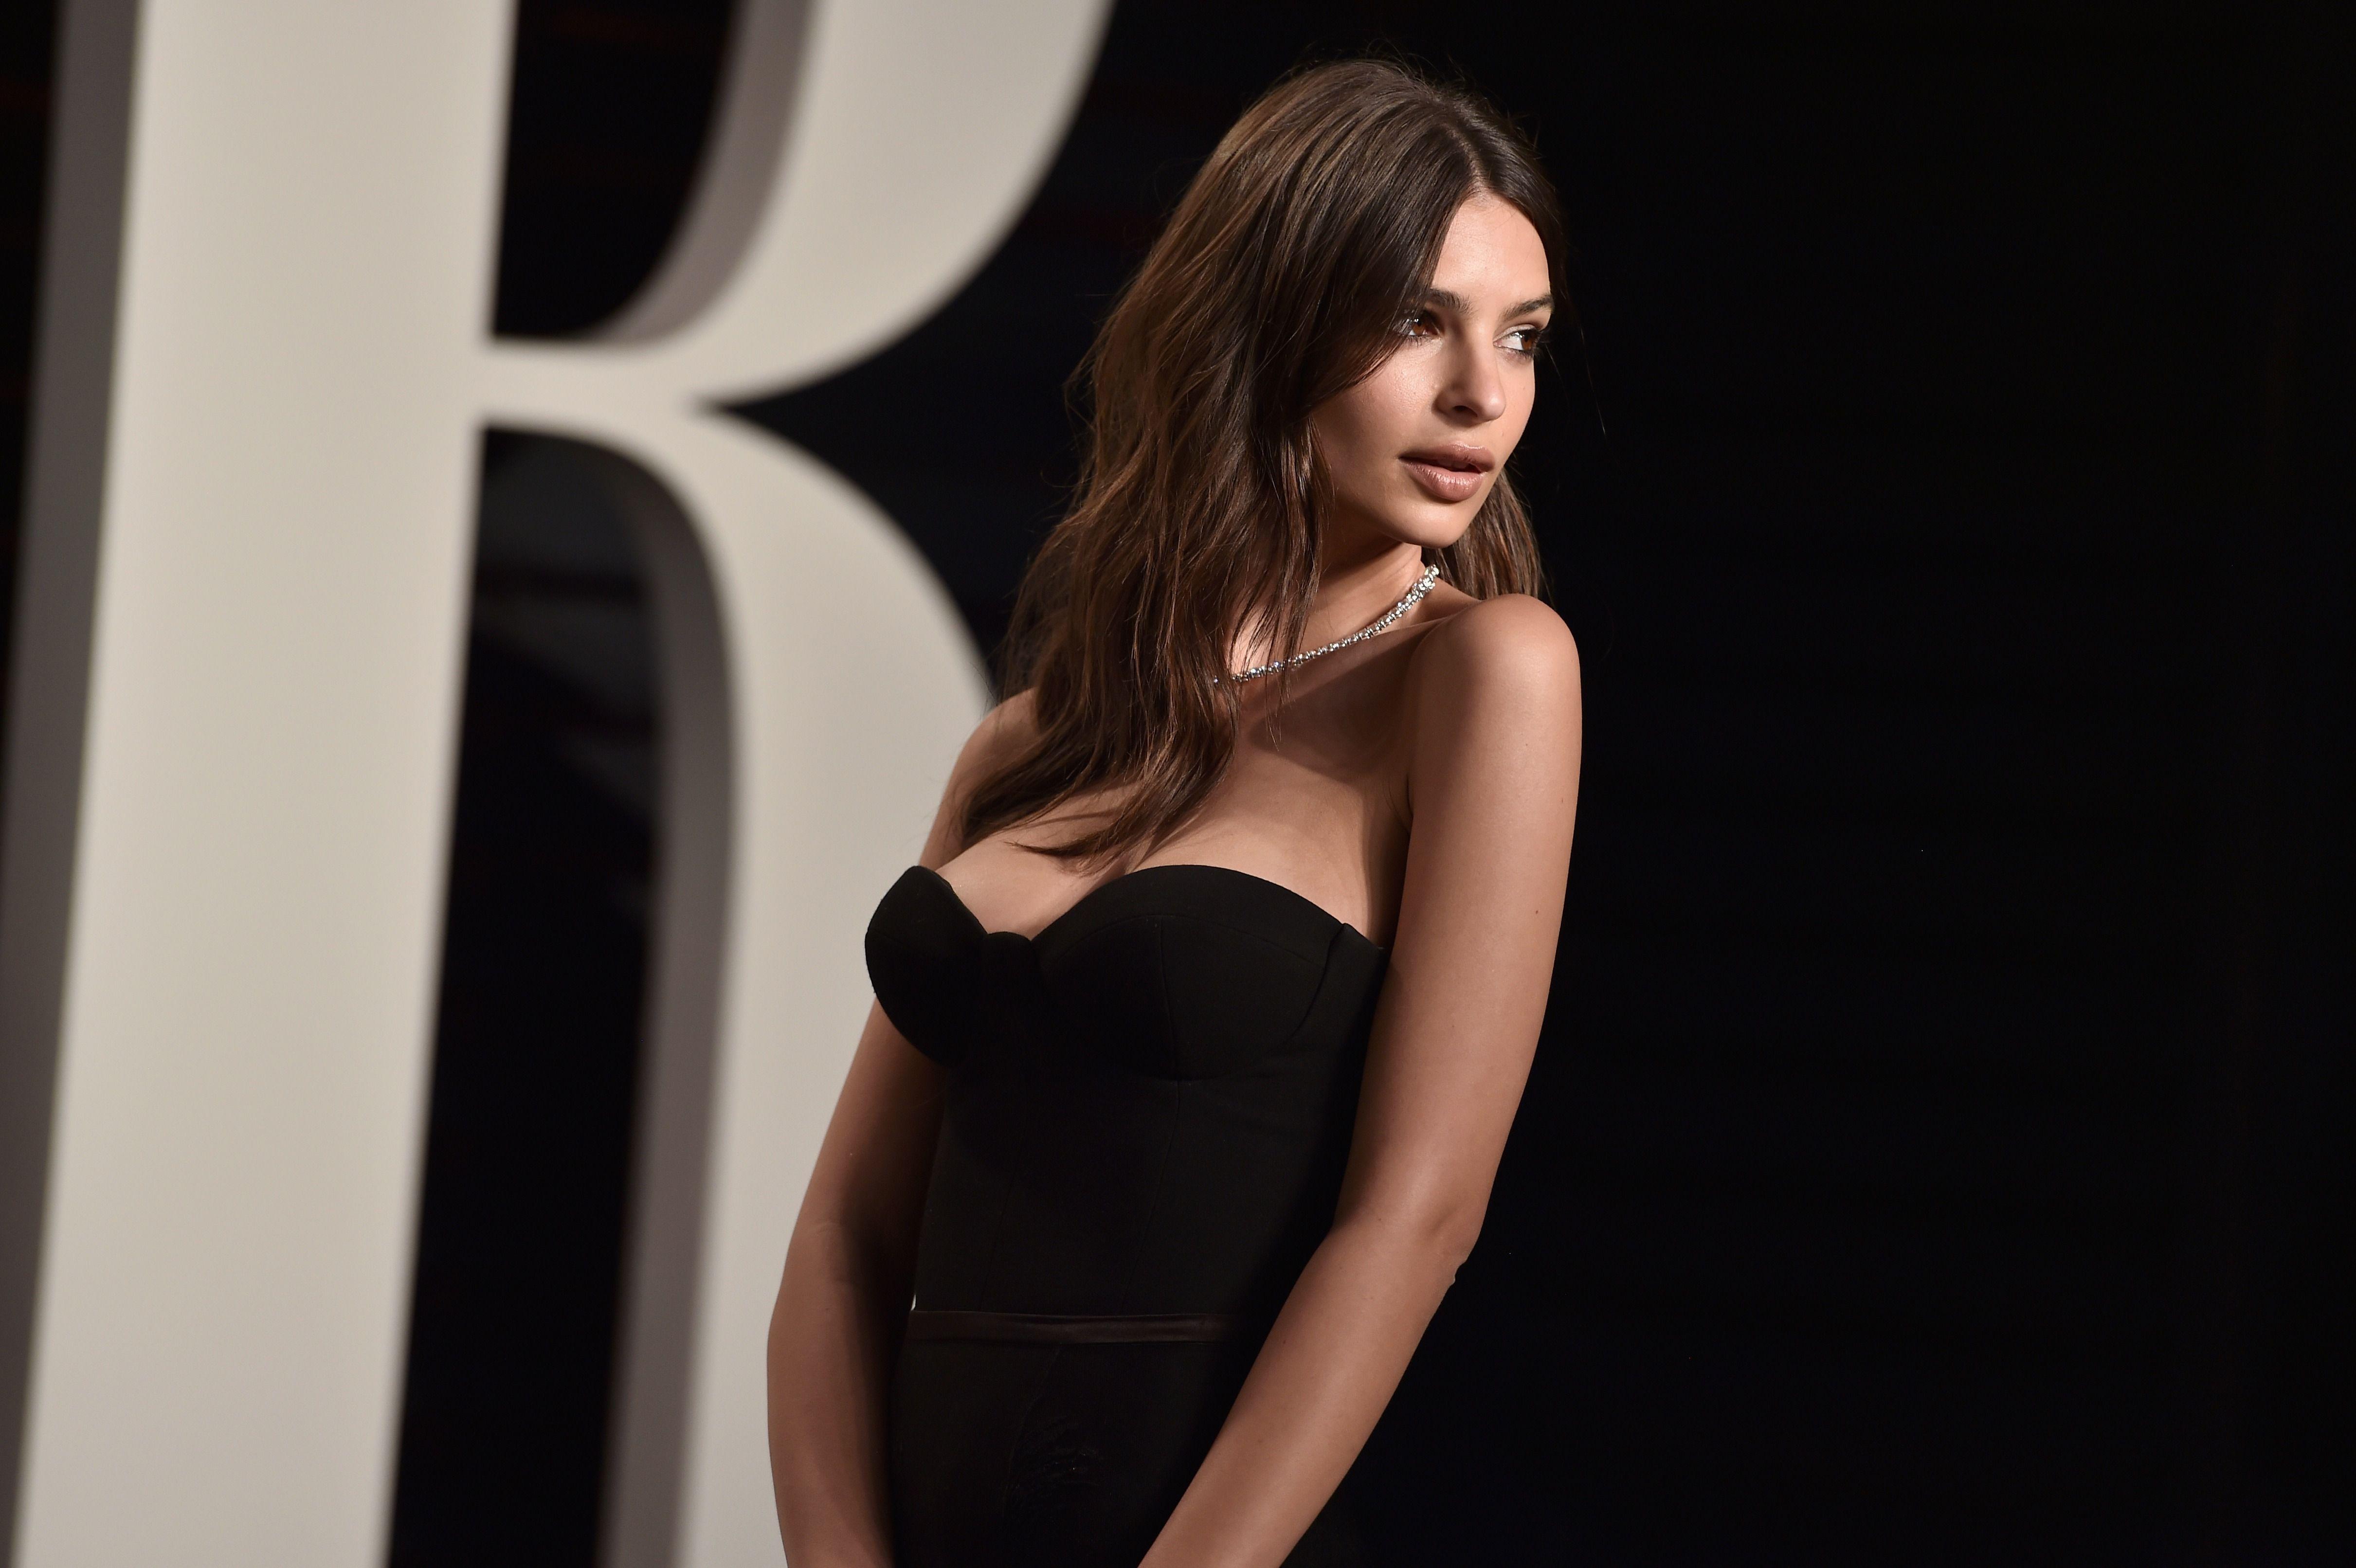 Emily Ratajkowski Kim Kardashian nude (65 photo), images Tits, iCloud, in bikini 2015